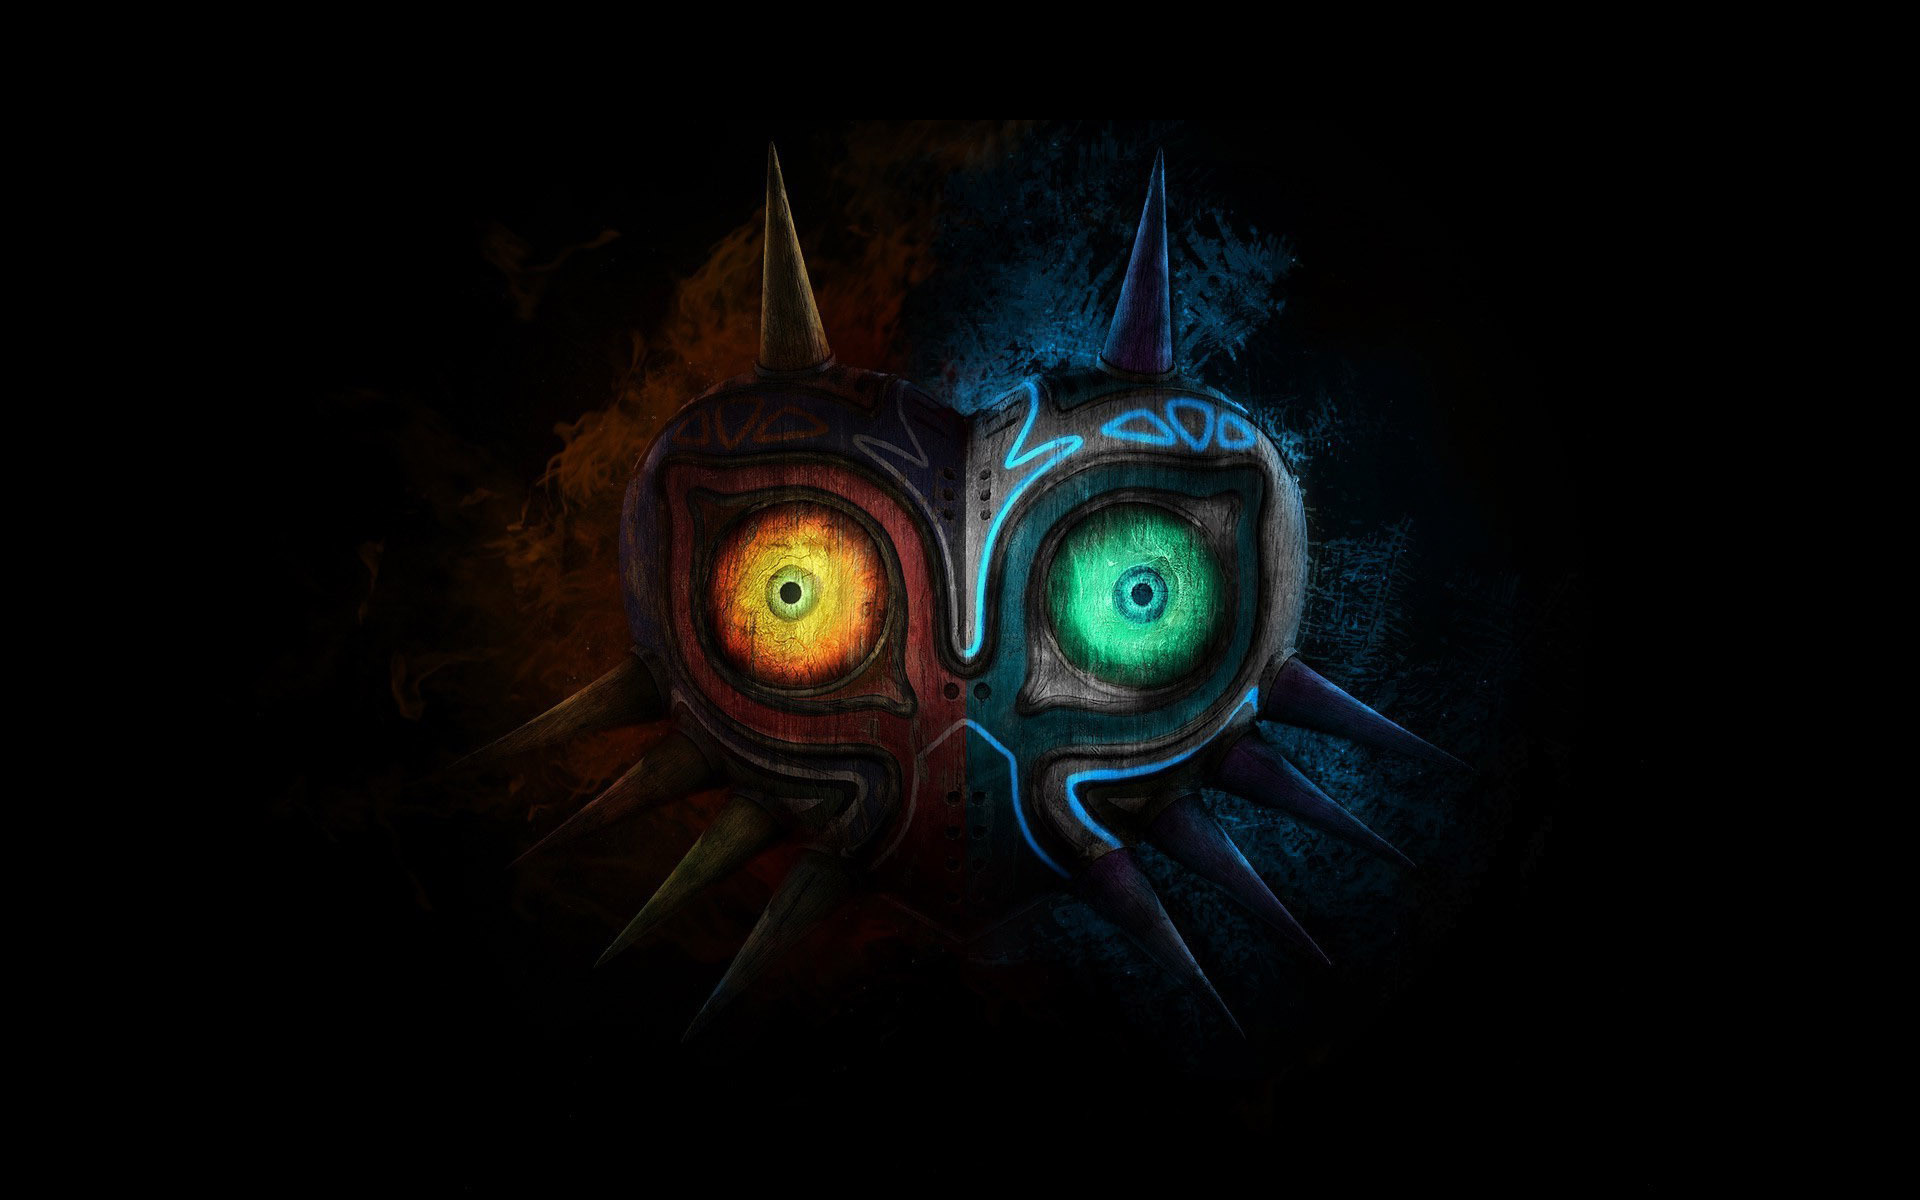 the legend of zelda majora mask ad On Codes PSN best video games like ps vita